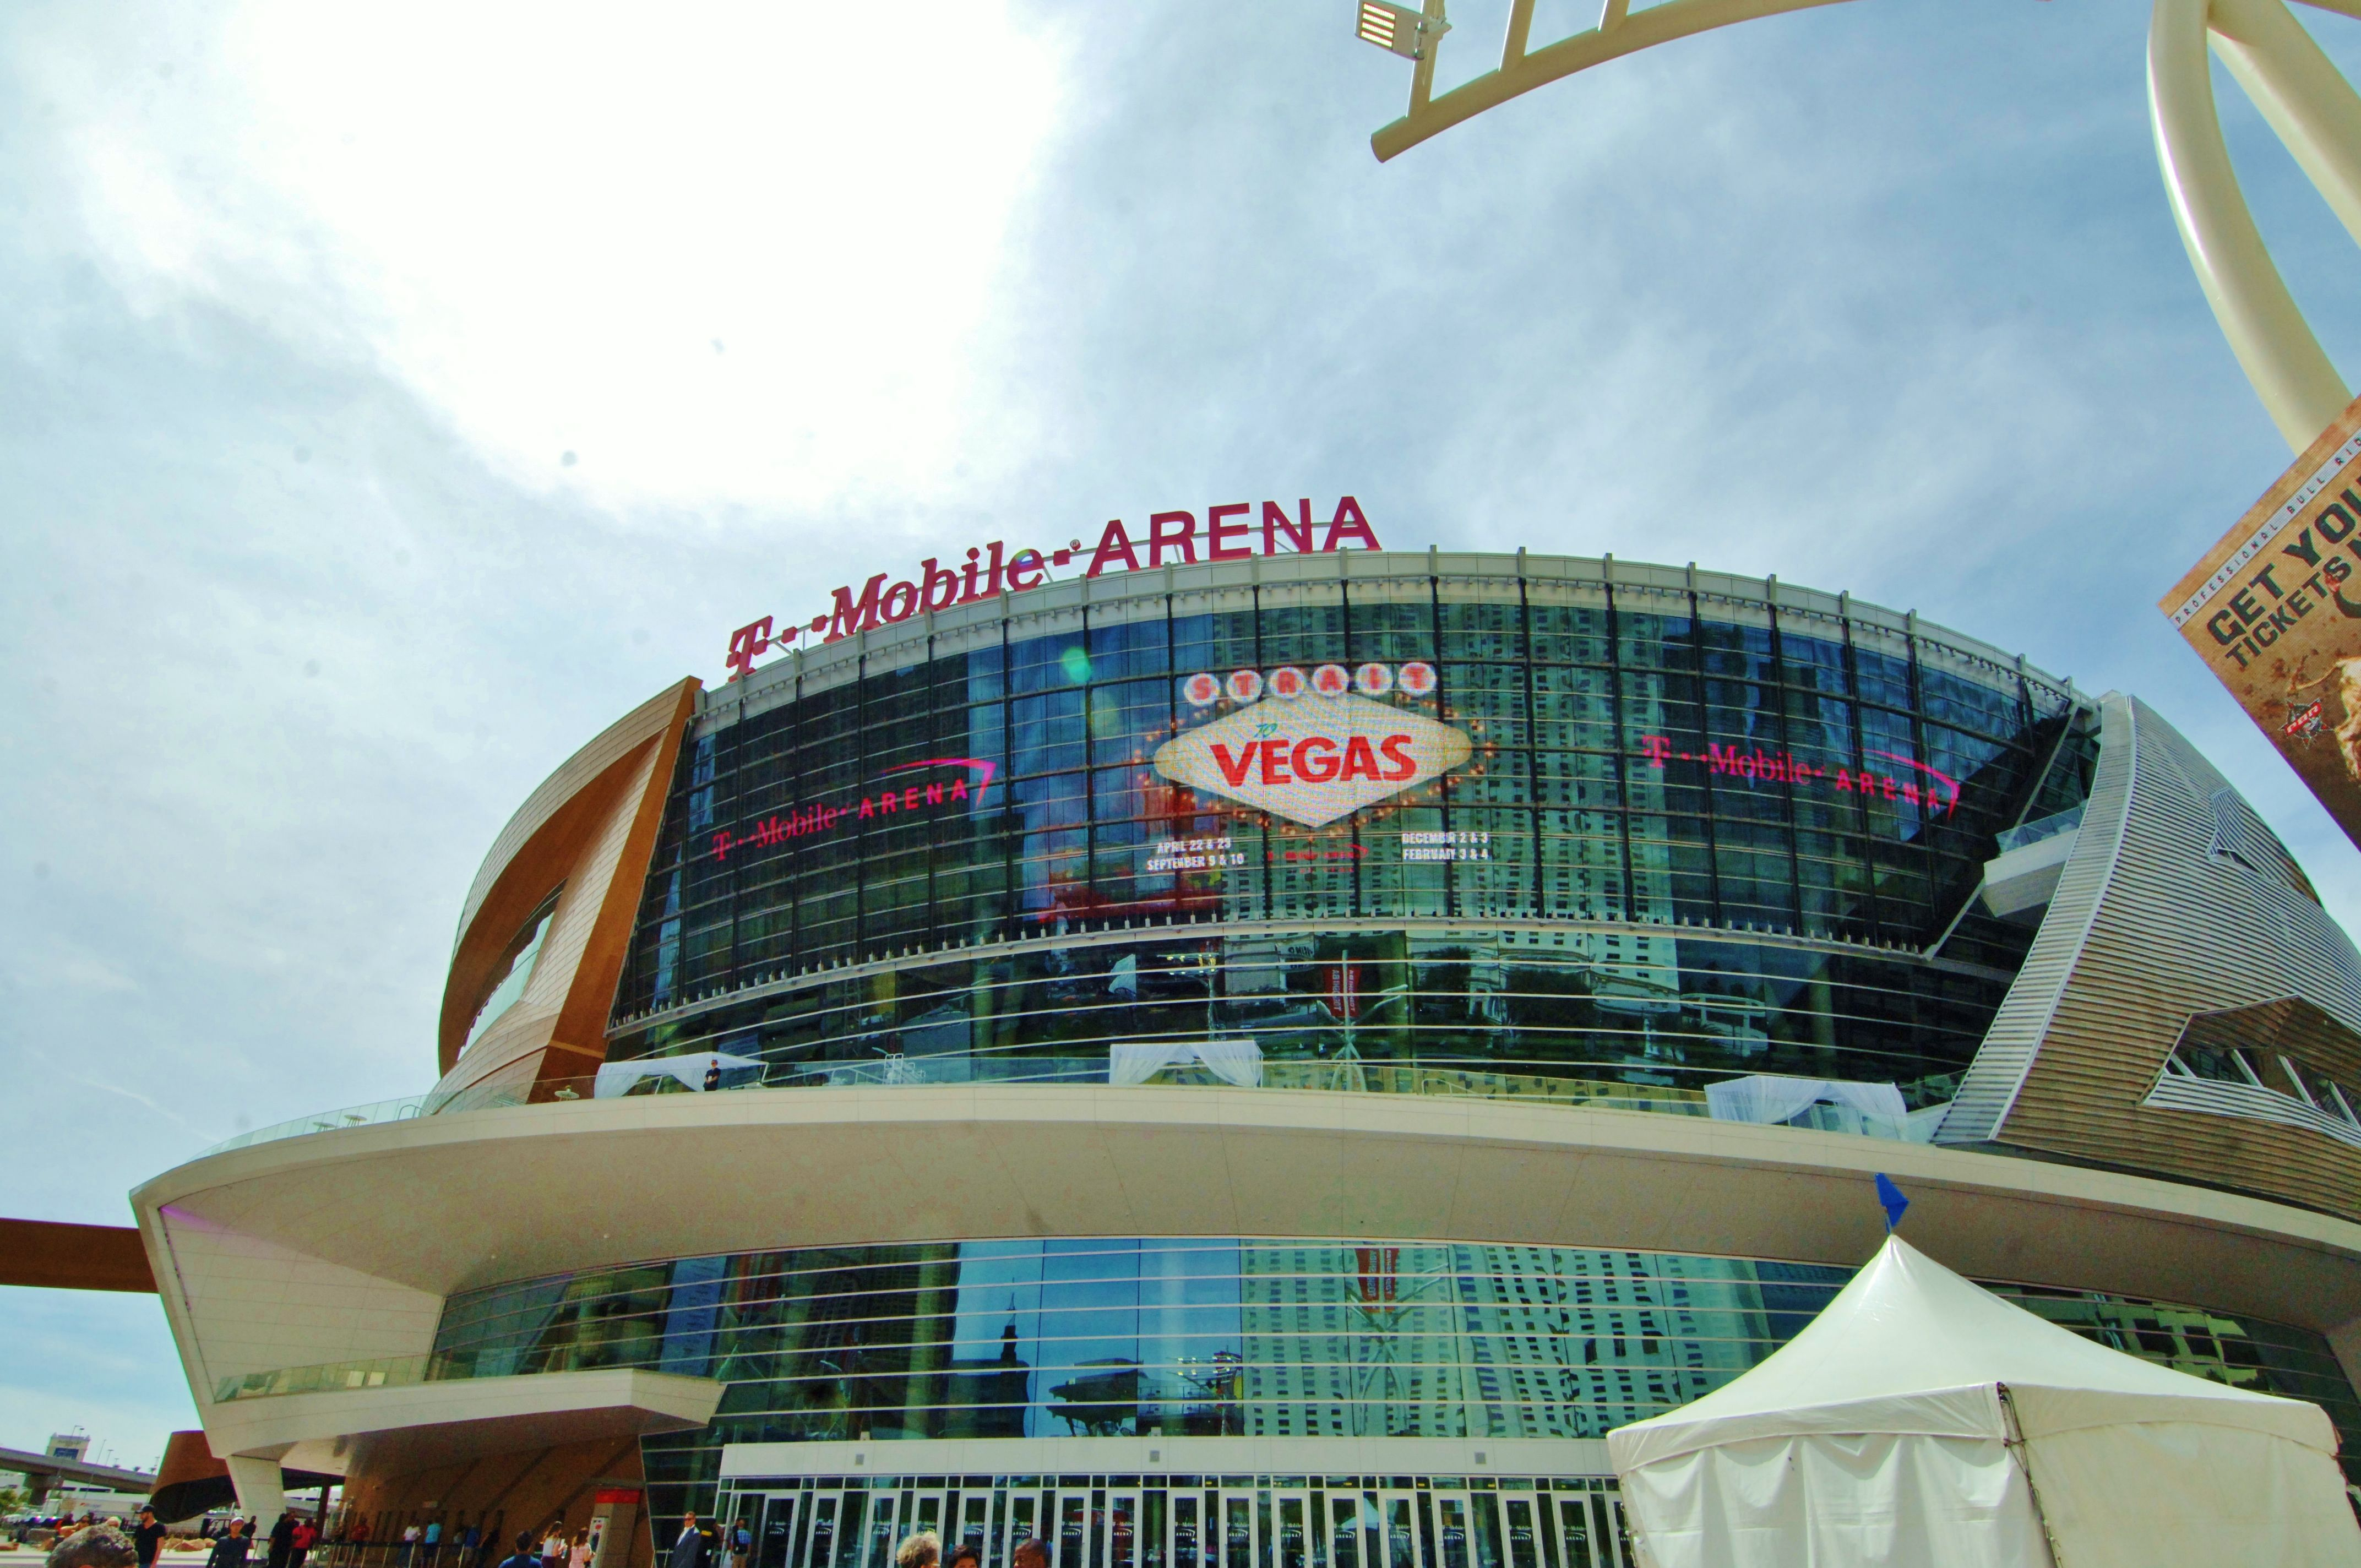 T Mobile arena Las Vegas Seating Chart